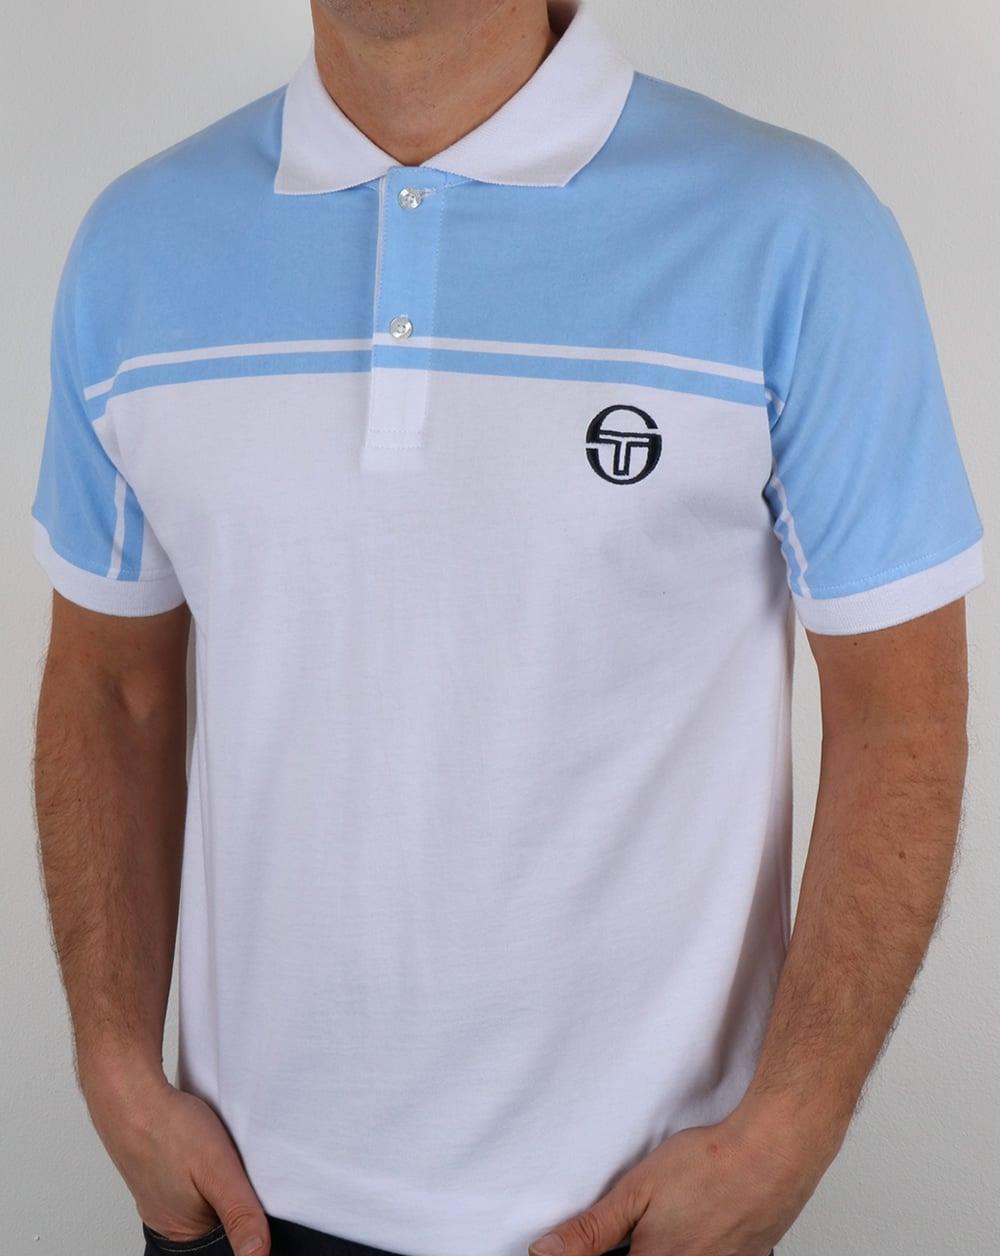 9a96ca36 Sergio Tacchini Sergio Tacchini New Young Line Polo Shirt White/sky Blue